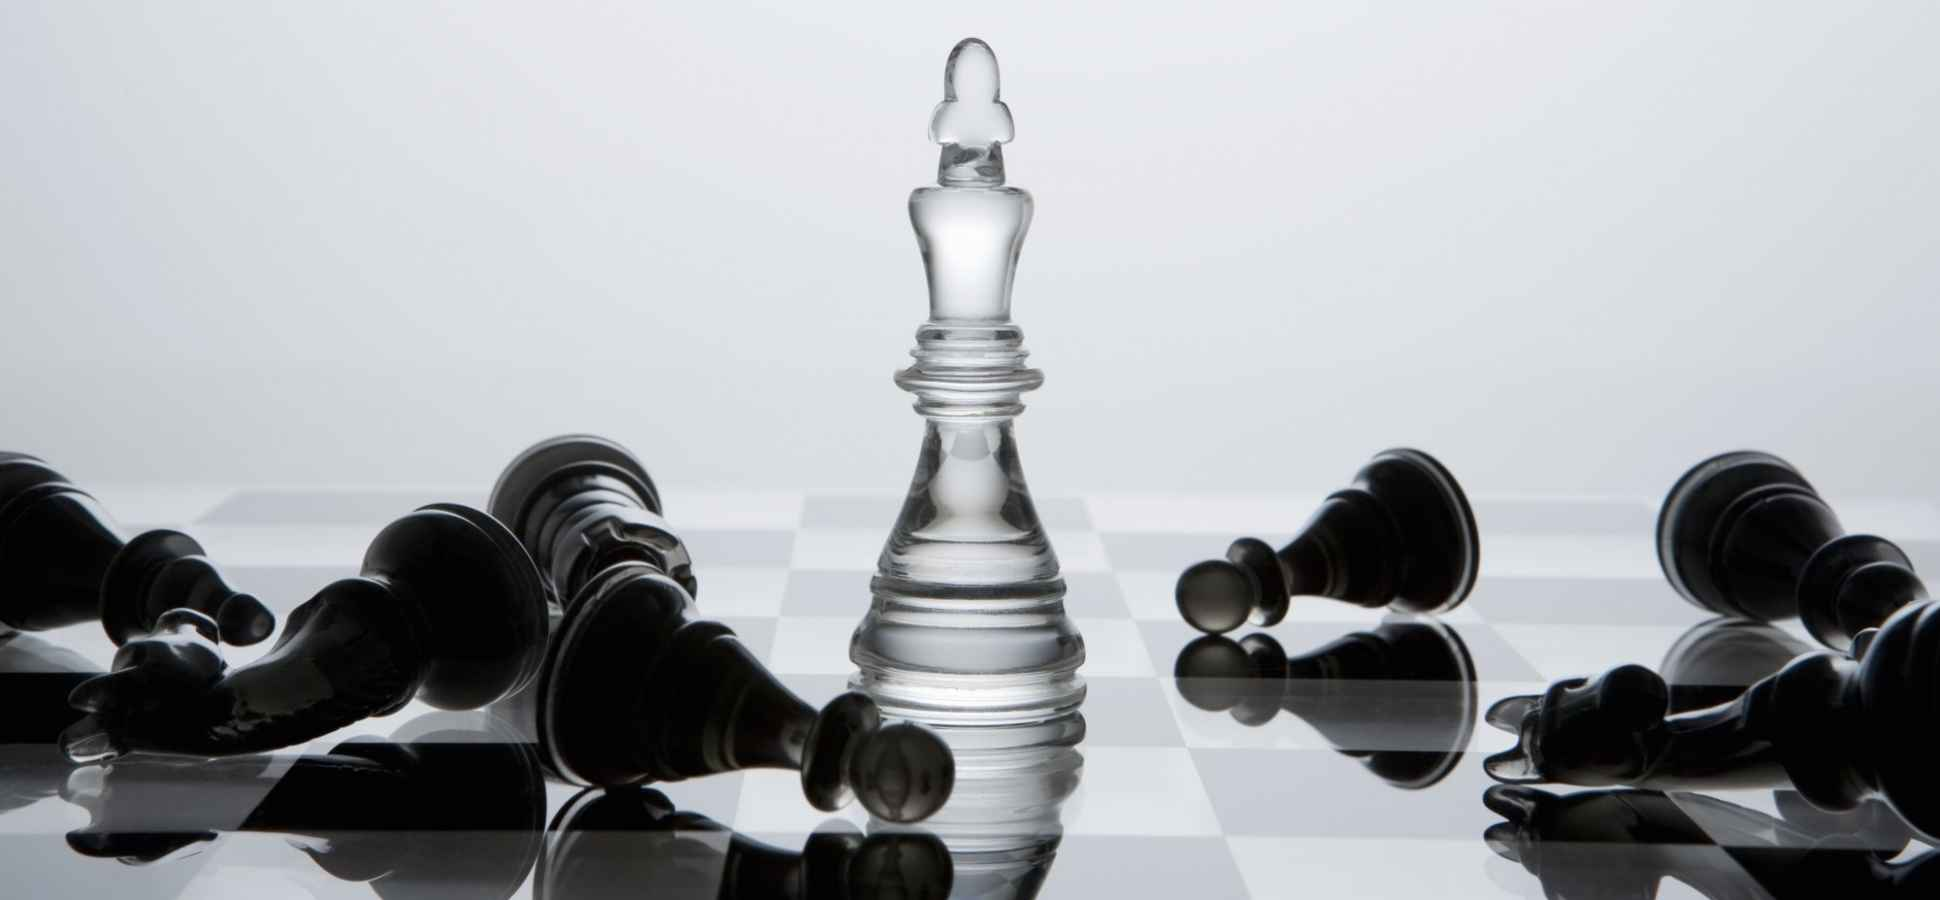 Tony Robbins' No. 1 Secret to Success